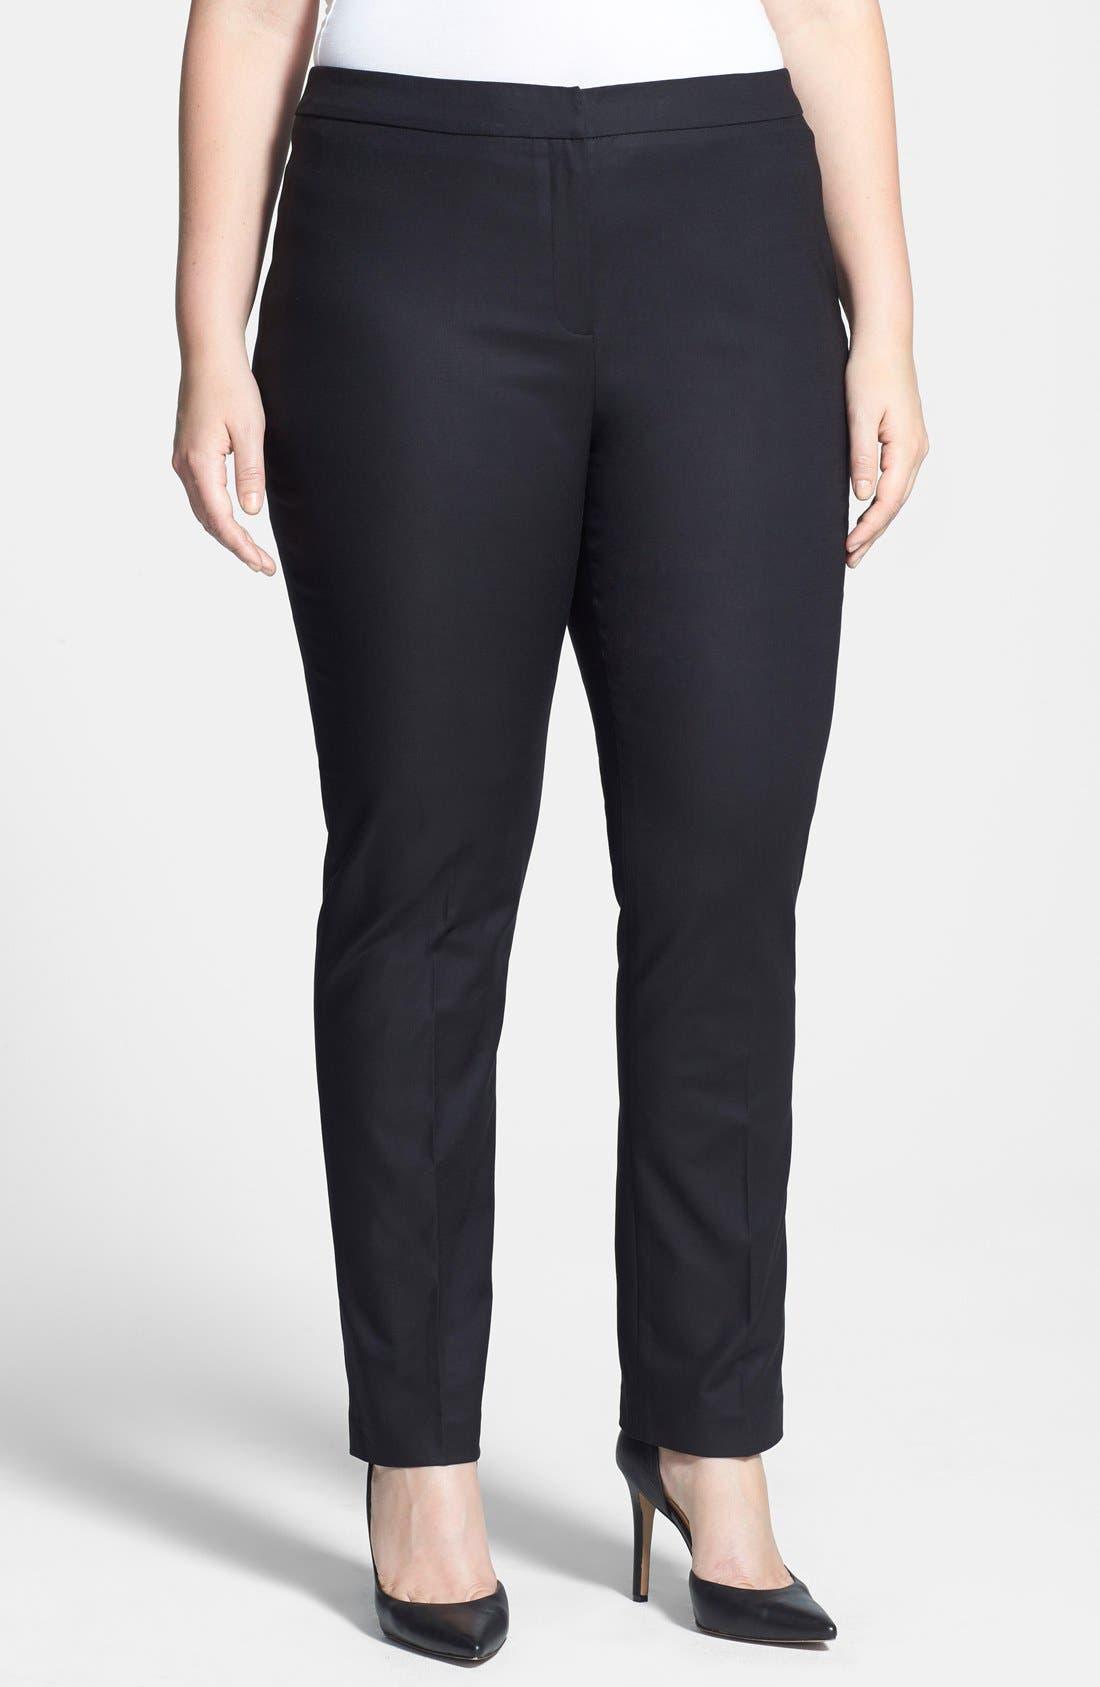 Main Image - NIC+ZOE 'The Perfect' Pants (Plus Size)